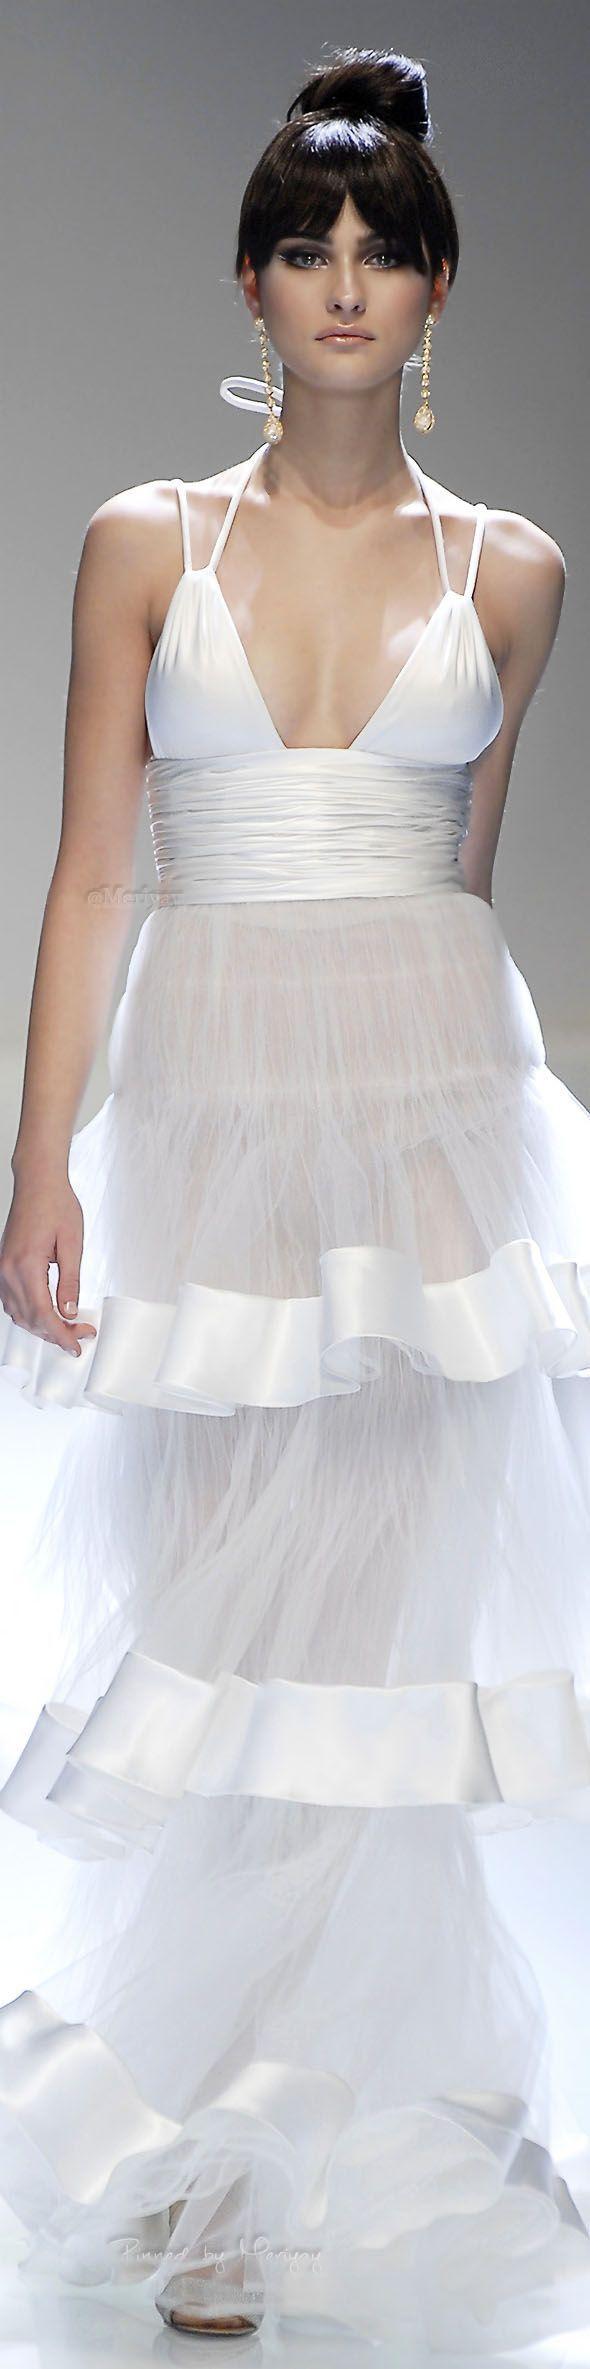 Tendance robe de mariée valentino mariage pinterest